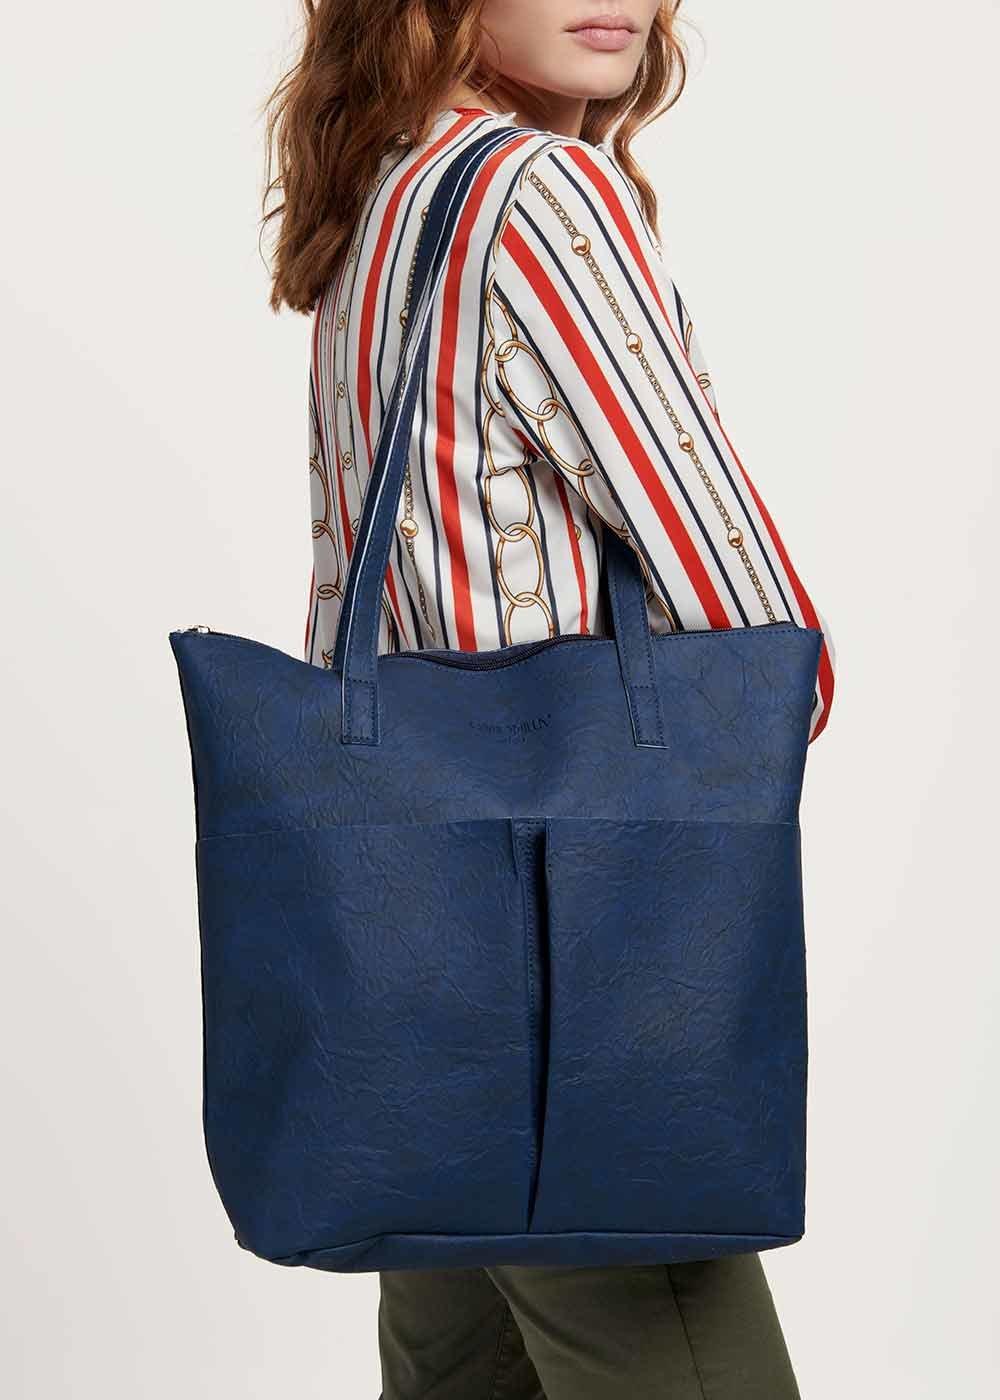 Blanche shopping bag with ruffles - Medium Blue - Woman